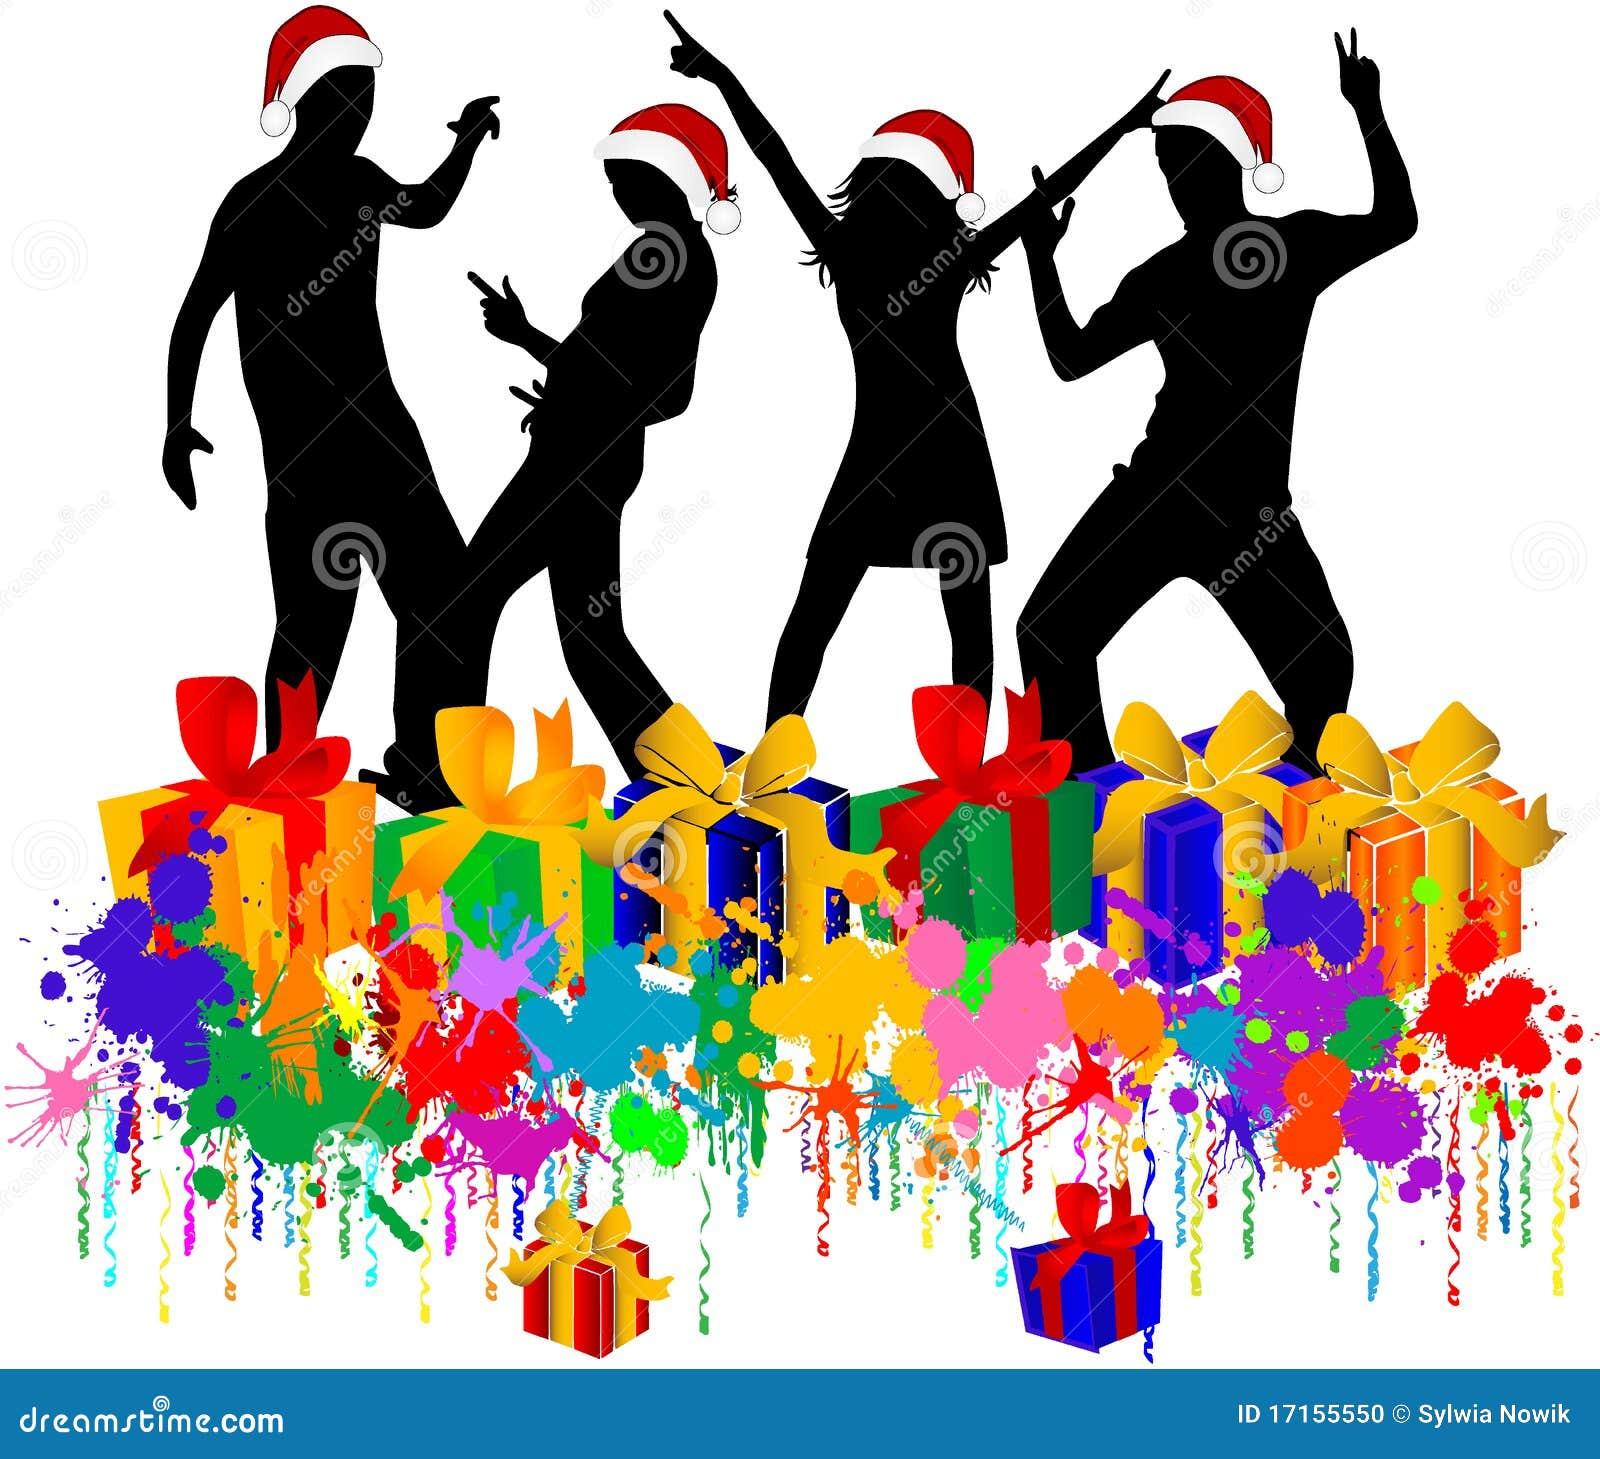 Christmas Party,Dancing men in Santa Claus hats.